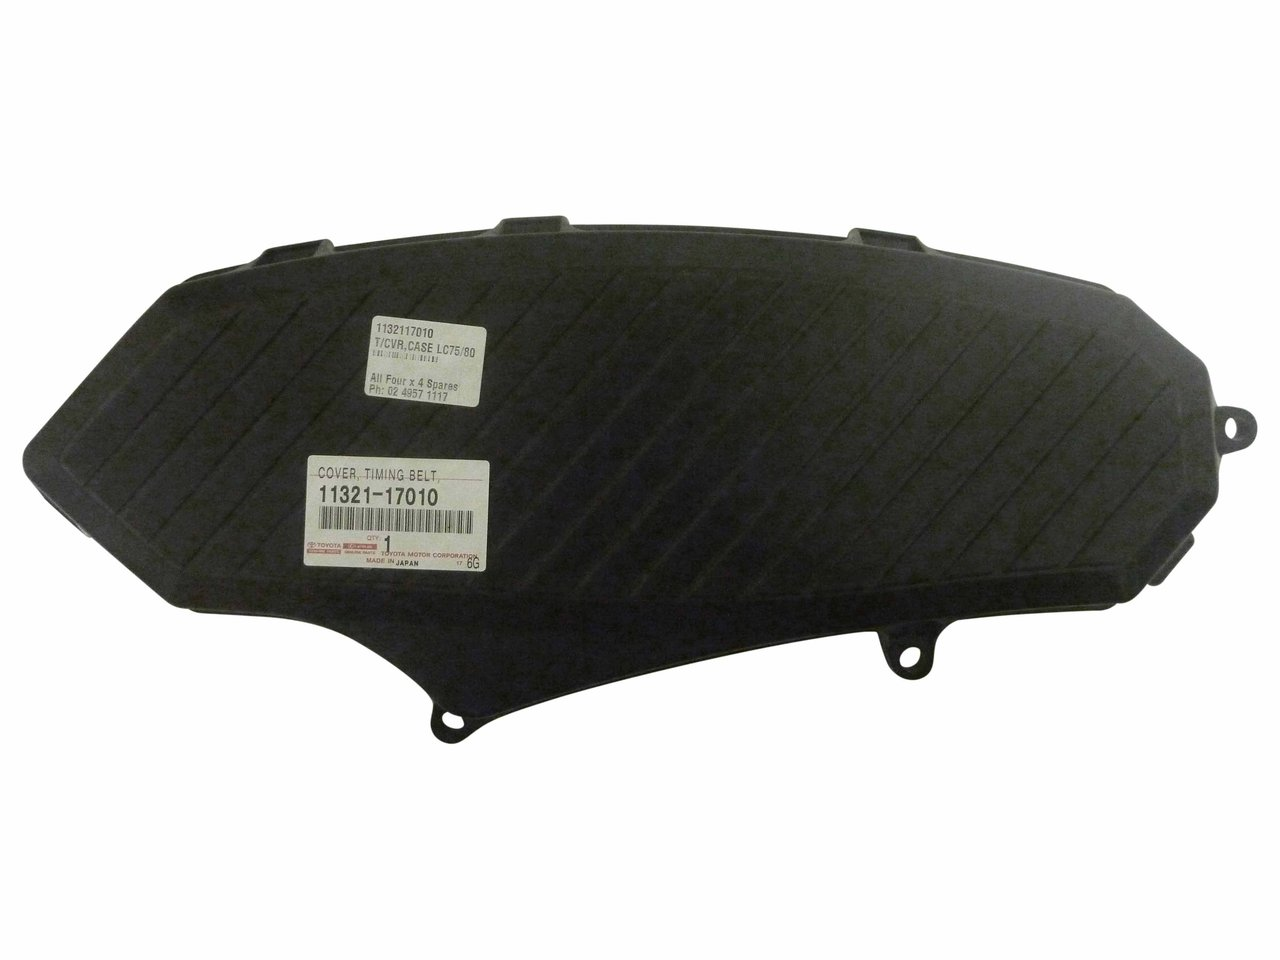 Timing Belt Cover suitable for Landcruiser 1HZ 1HD 75 80 Genuine